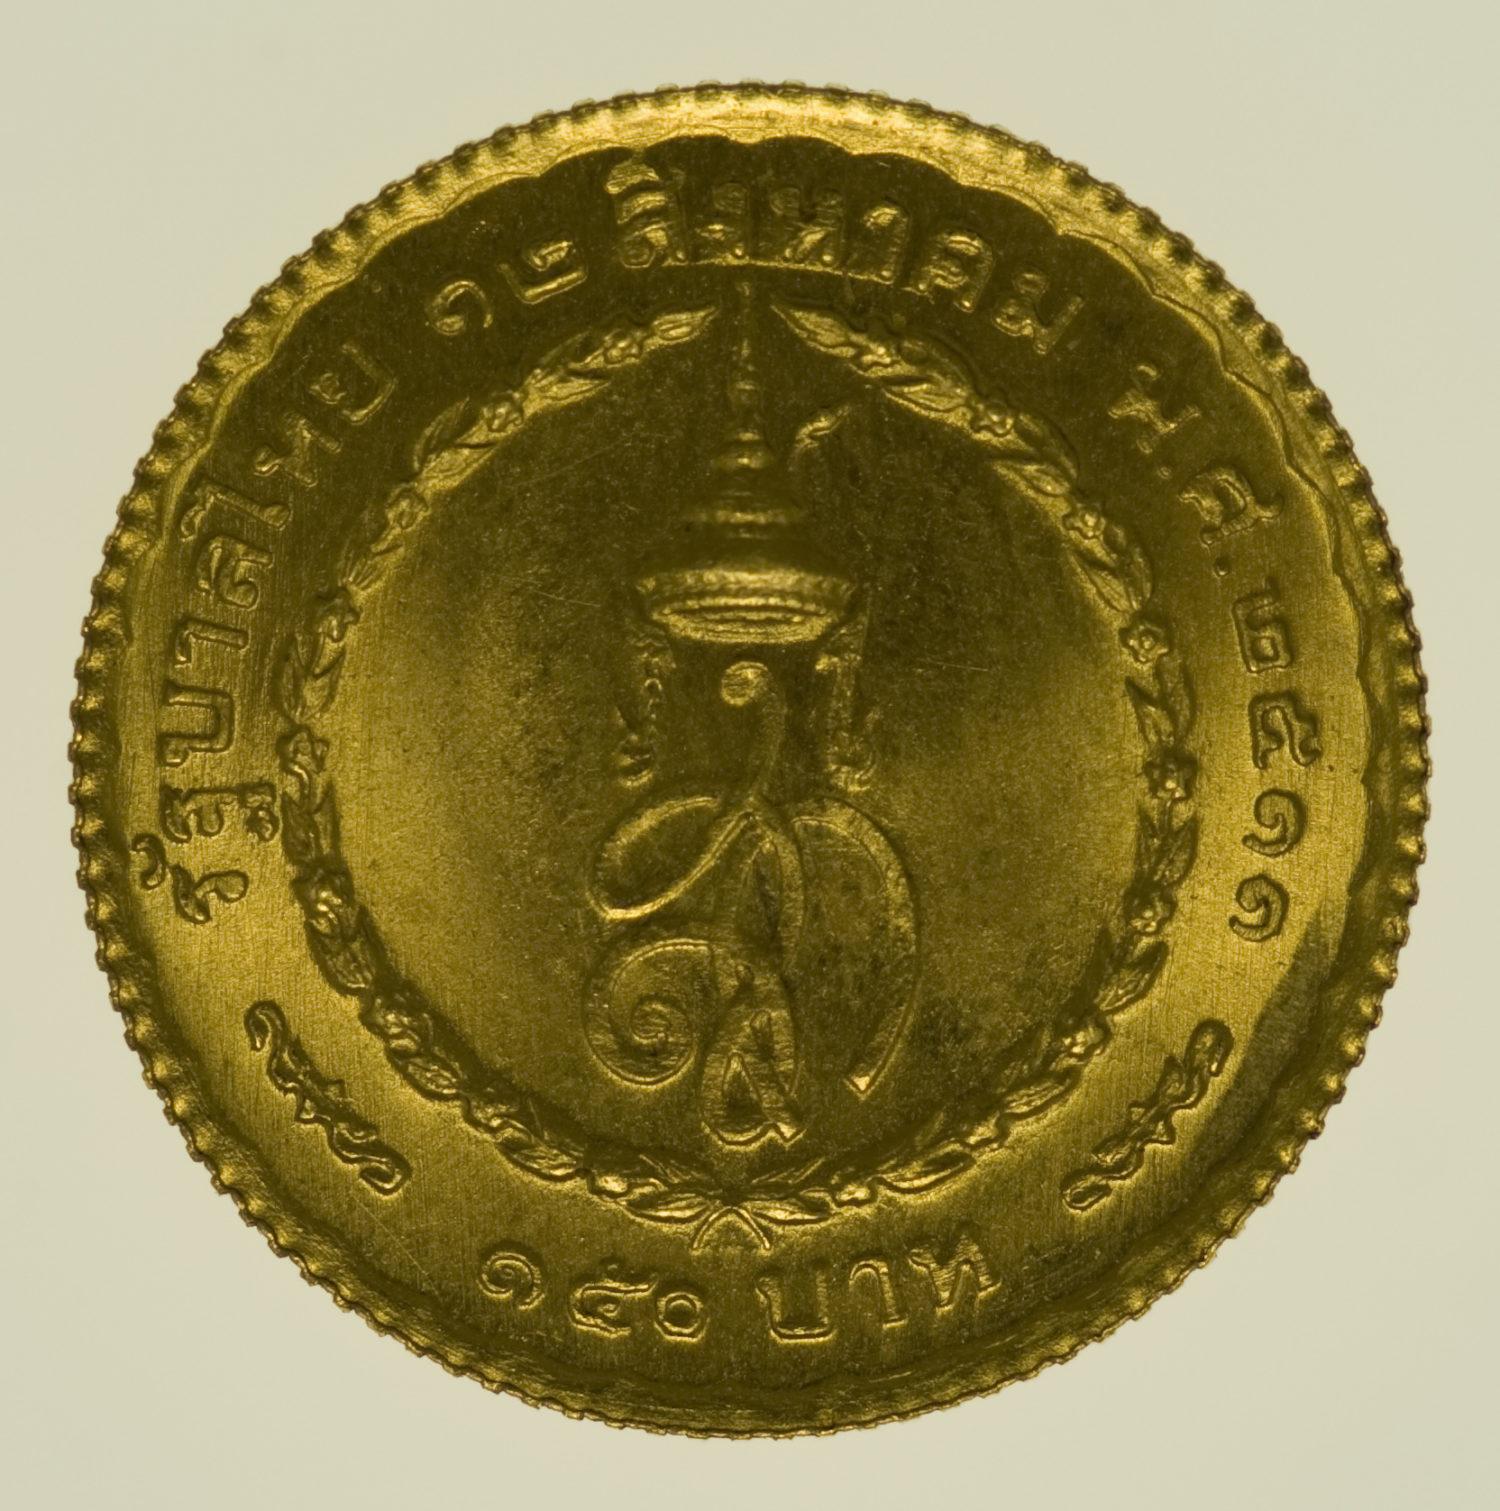 thailand - Thailand Rama IX. 150 Baht 1968